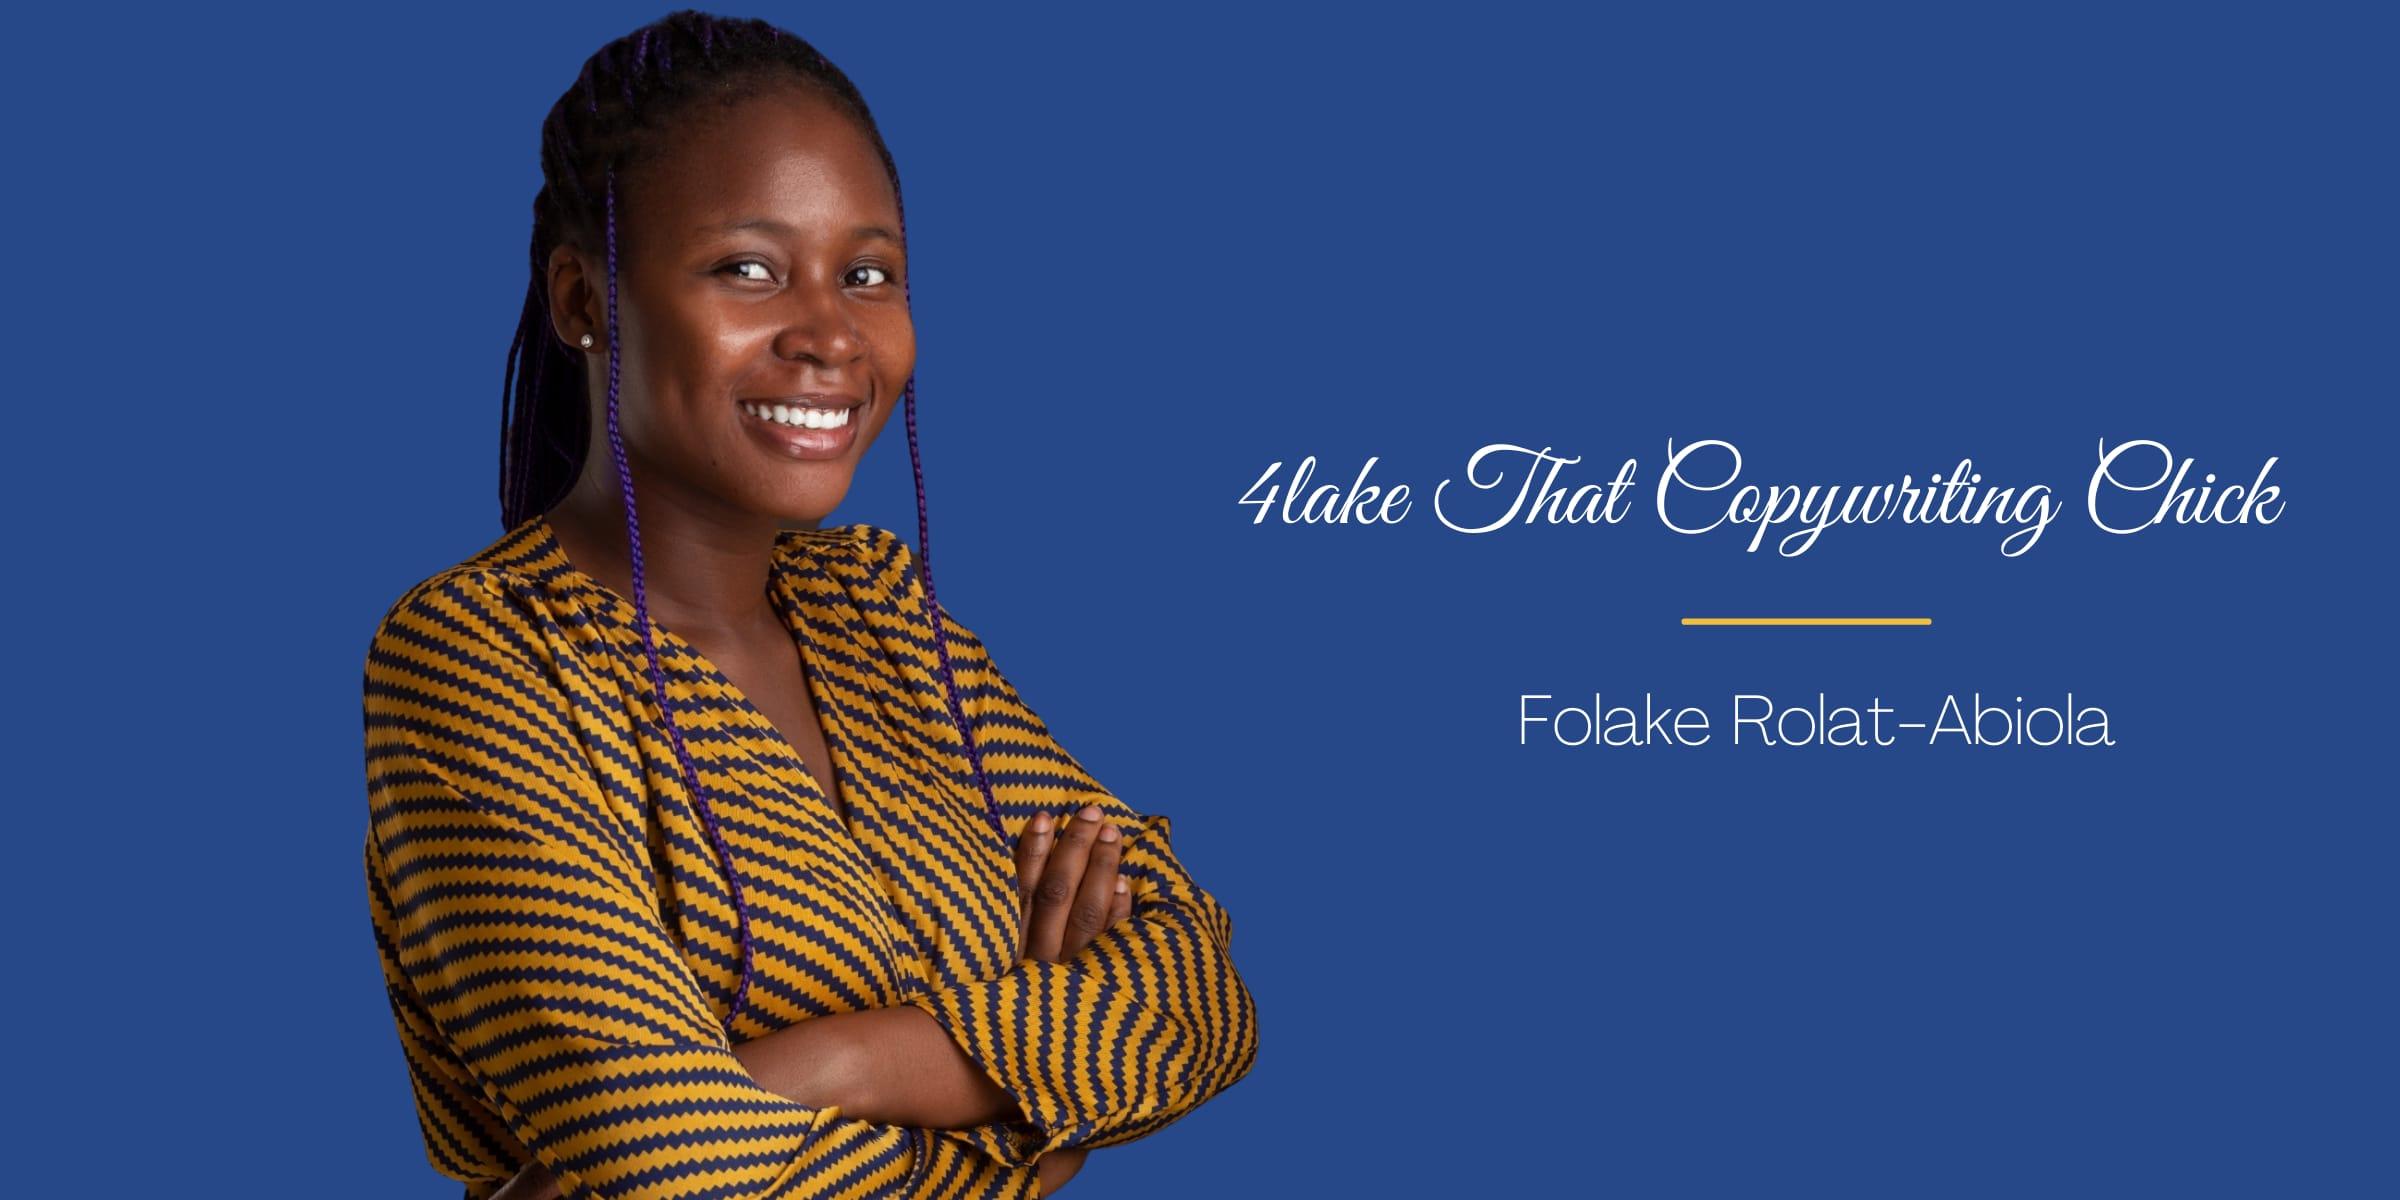 Folake Rolat-Abiola